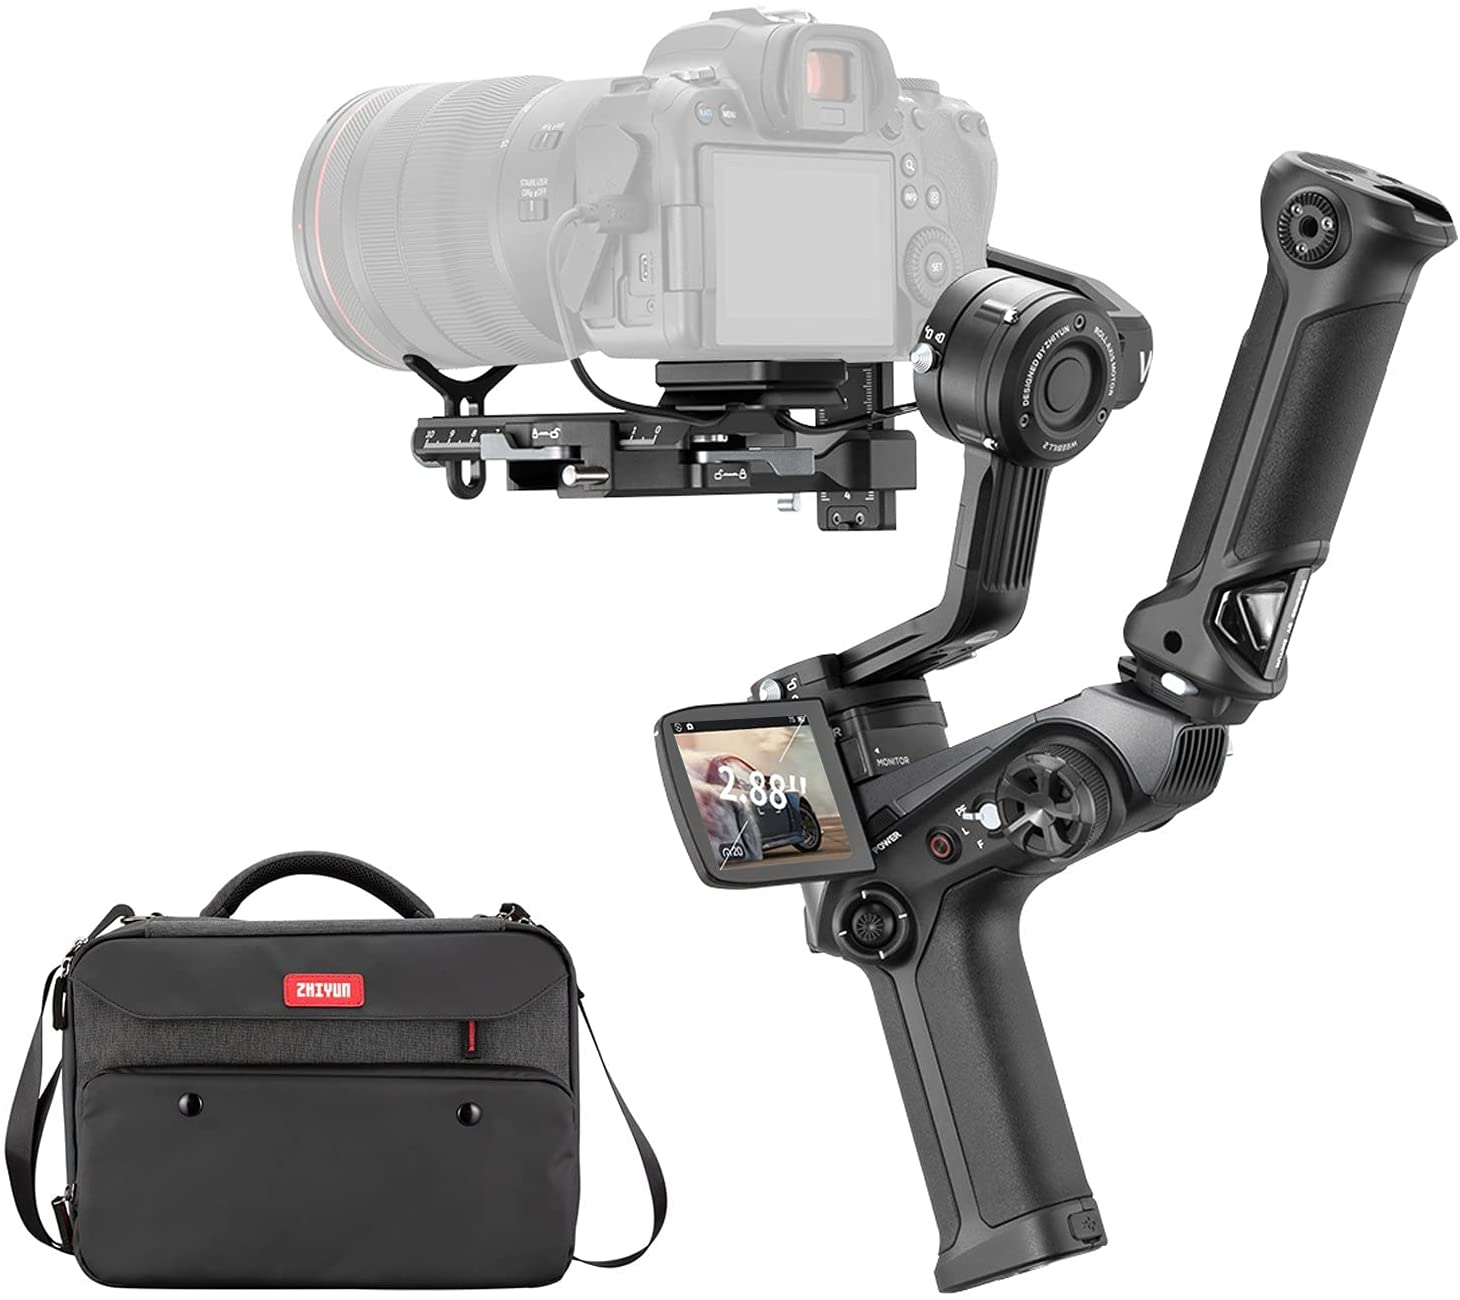 Zhiyun Weebill 2,3-Axis Handheld Gimbal Stabilizer for DSLR Camera Mirrorless Cameras with Sony Nikon Canon Panasonic LUMIX